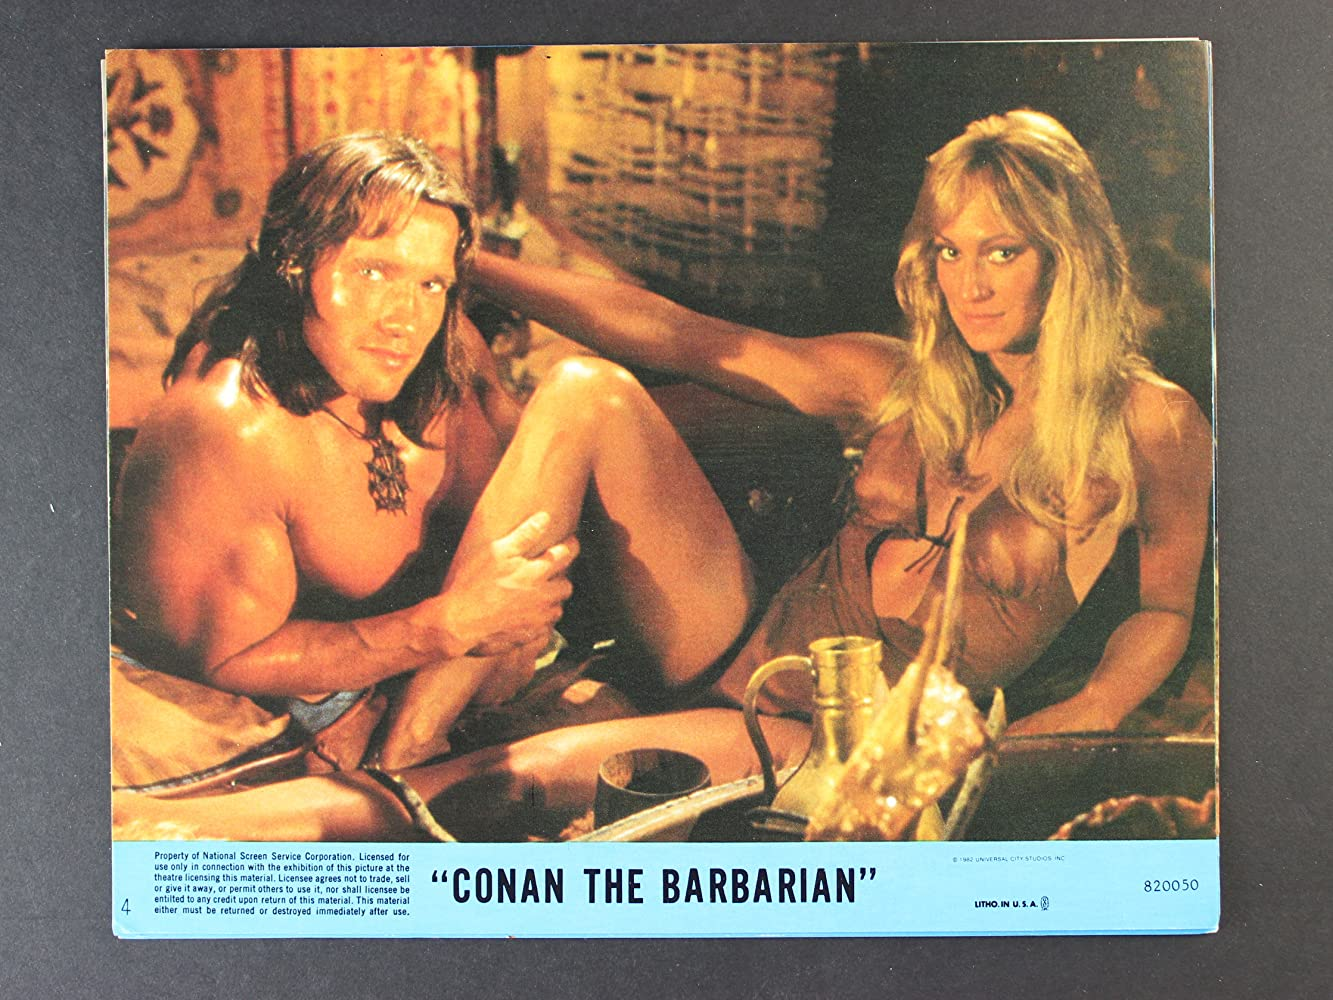 with barbarian Conan women the